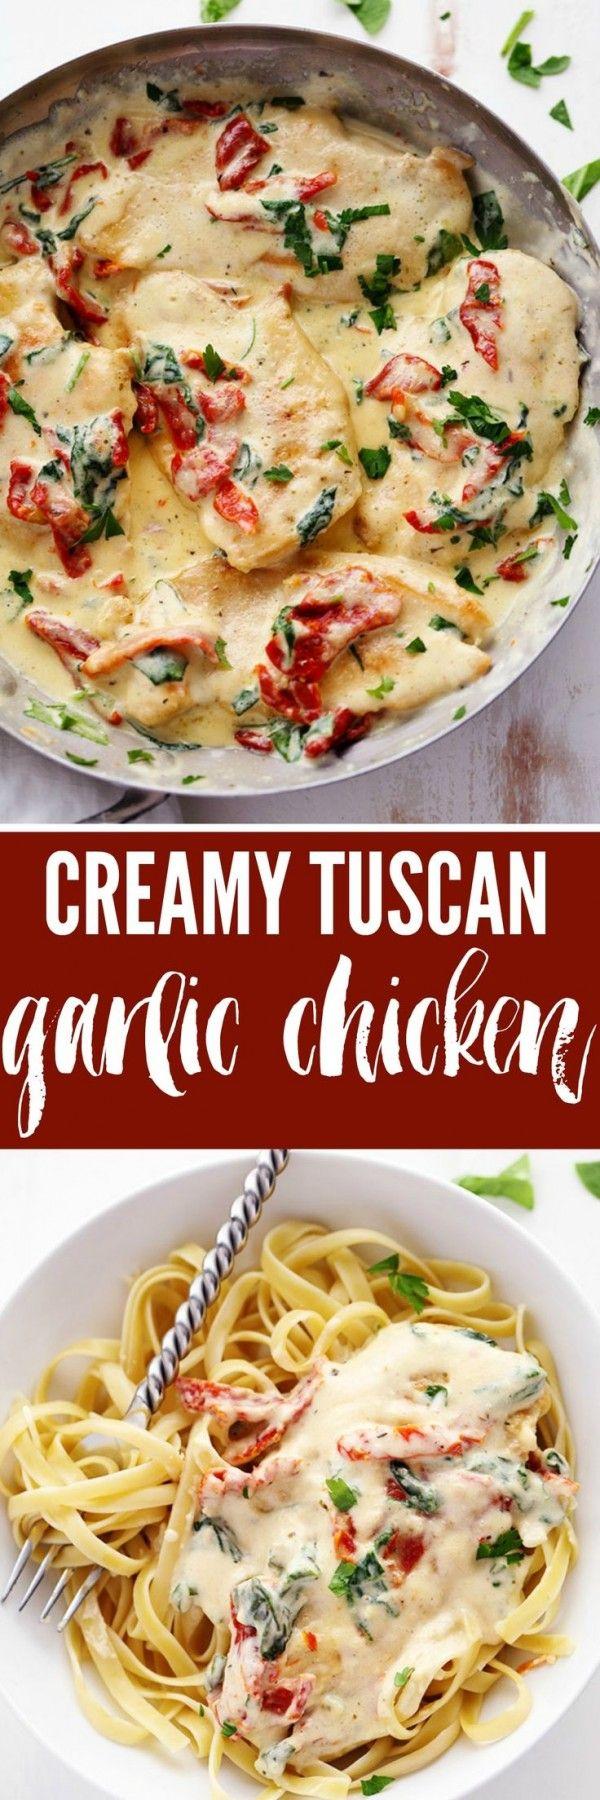 Get the recipe Creamy Tuscan Garlic Chicken @recipes_to_go